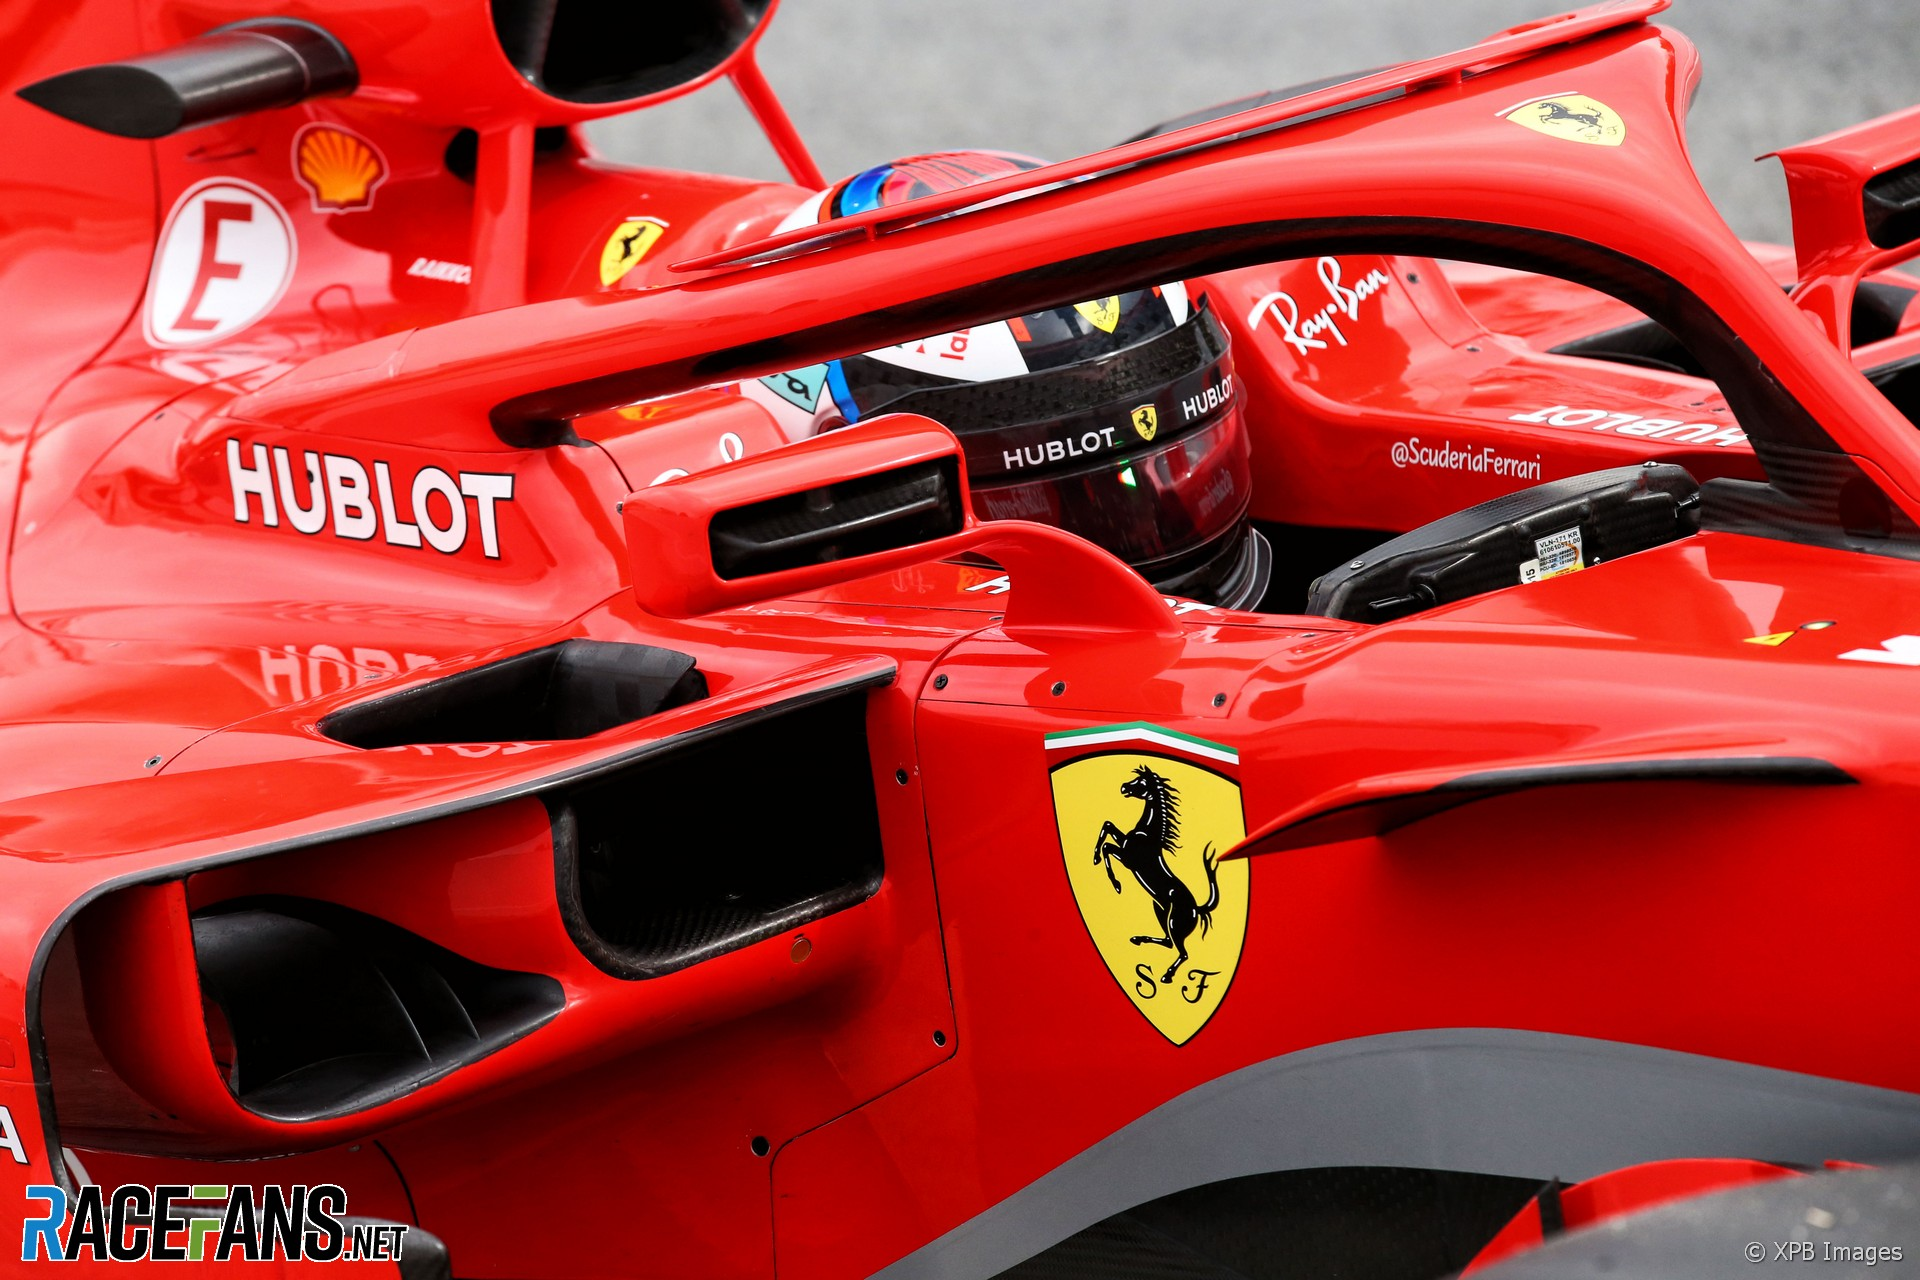 Ferrari SF71H wing mirror, Circuit de Catalunya, 2018